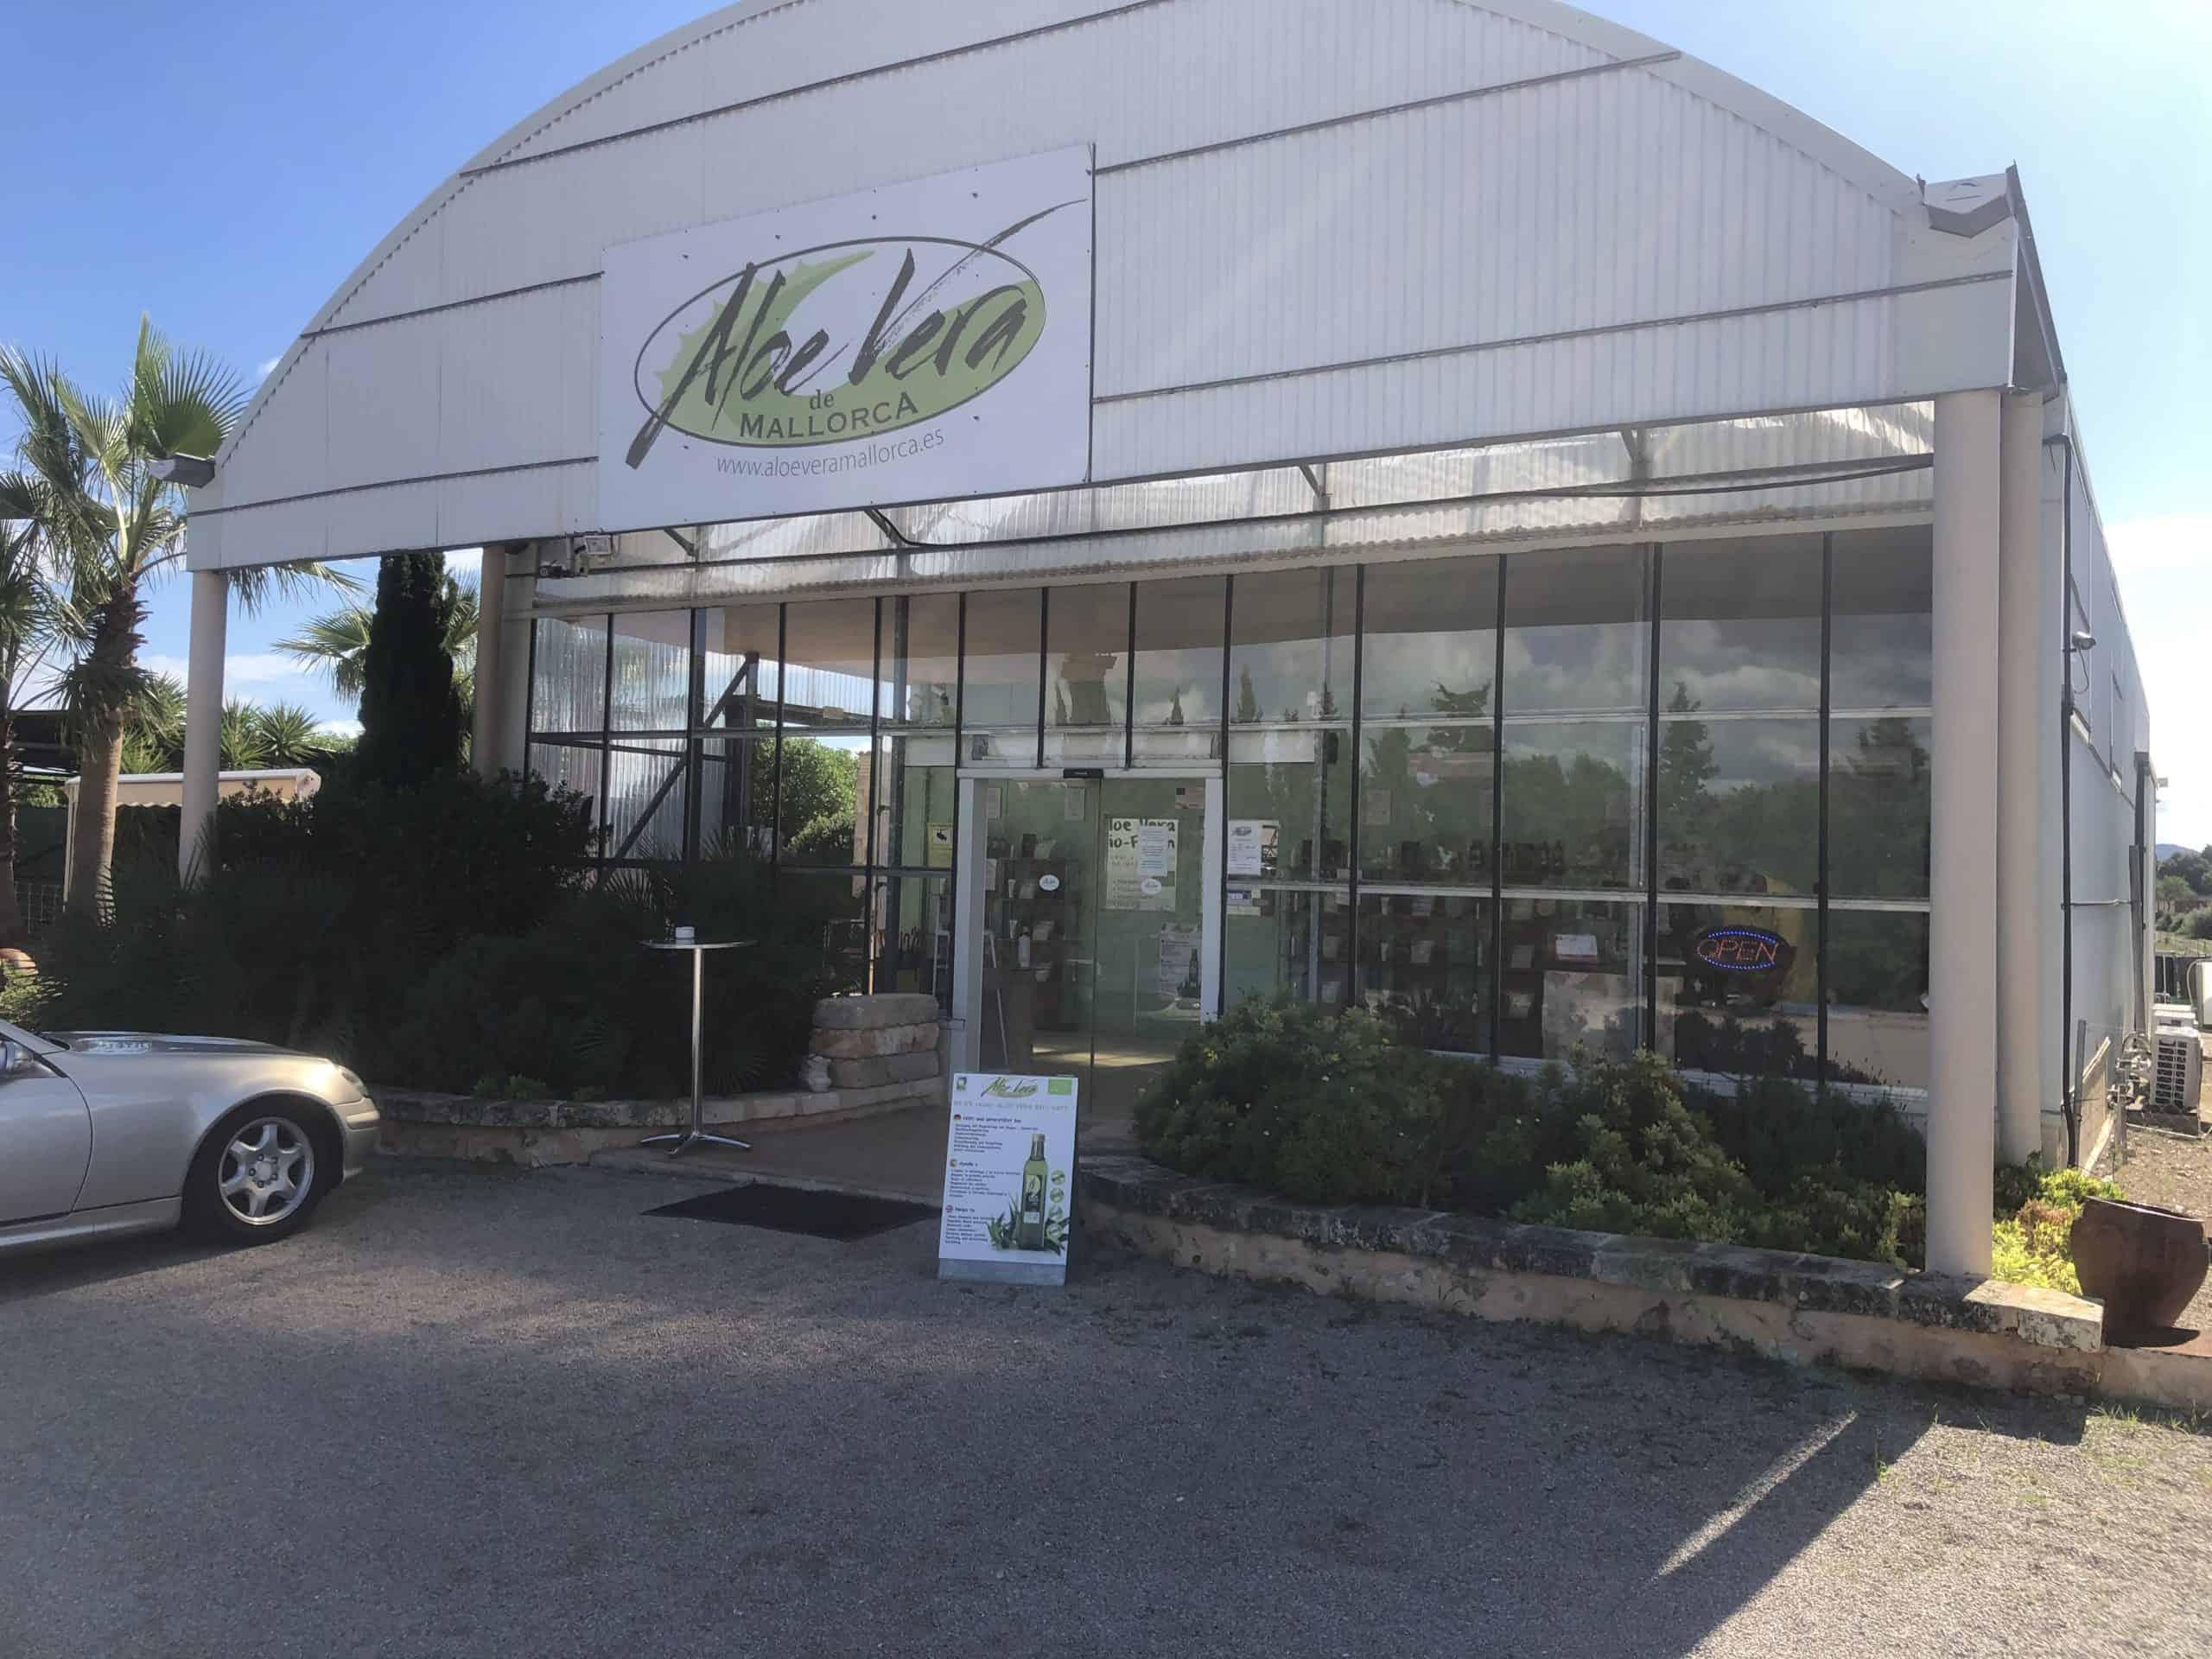 Aloe Vera Farm Santa Margalida Mallorca